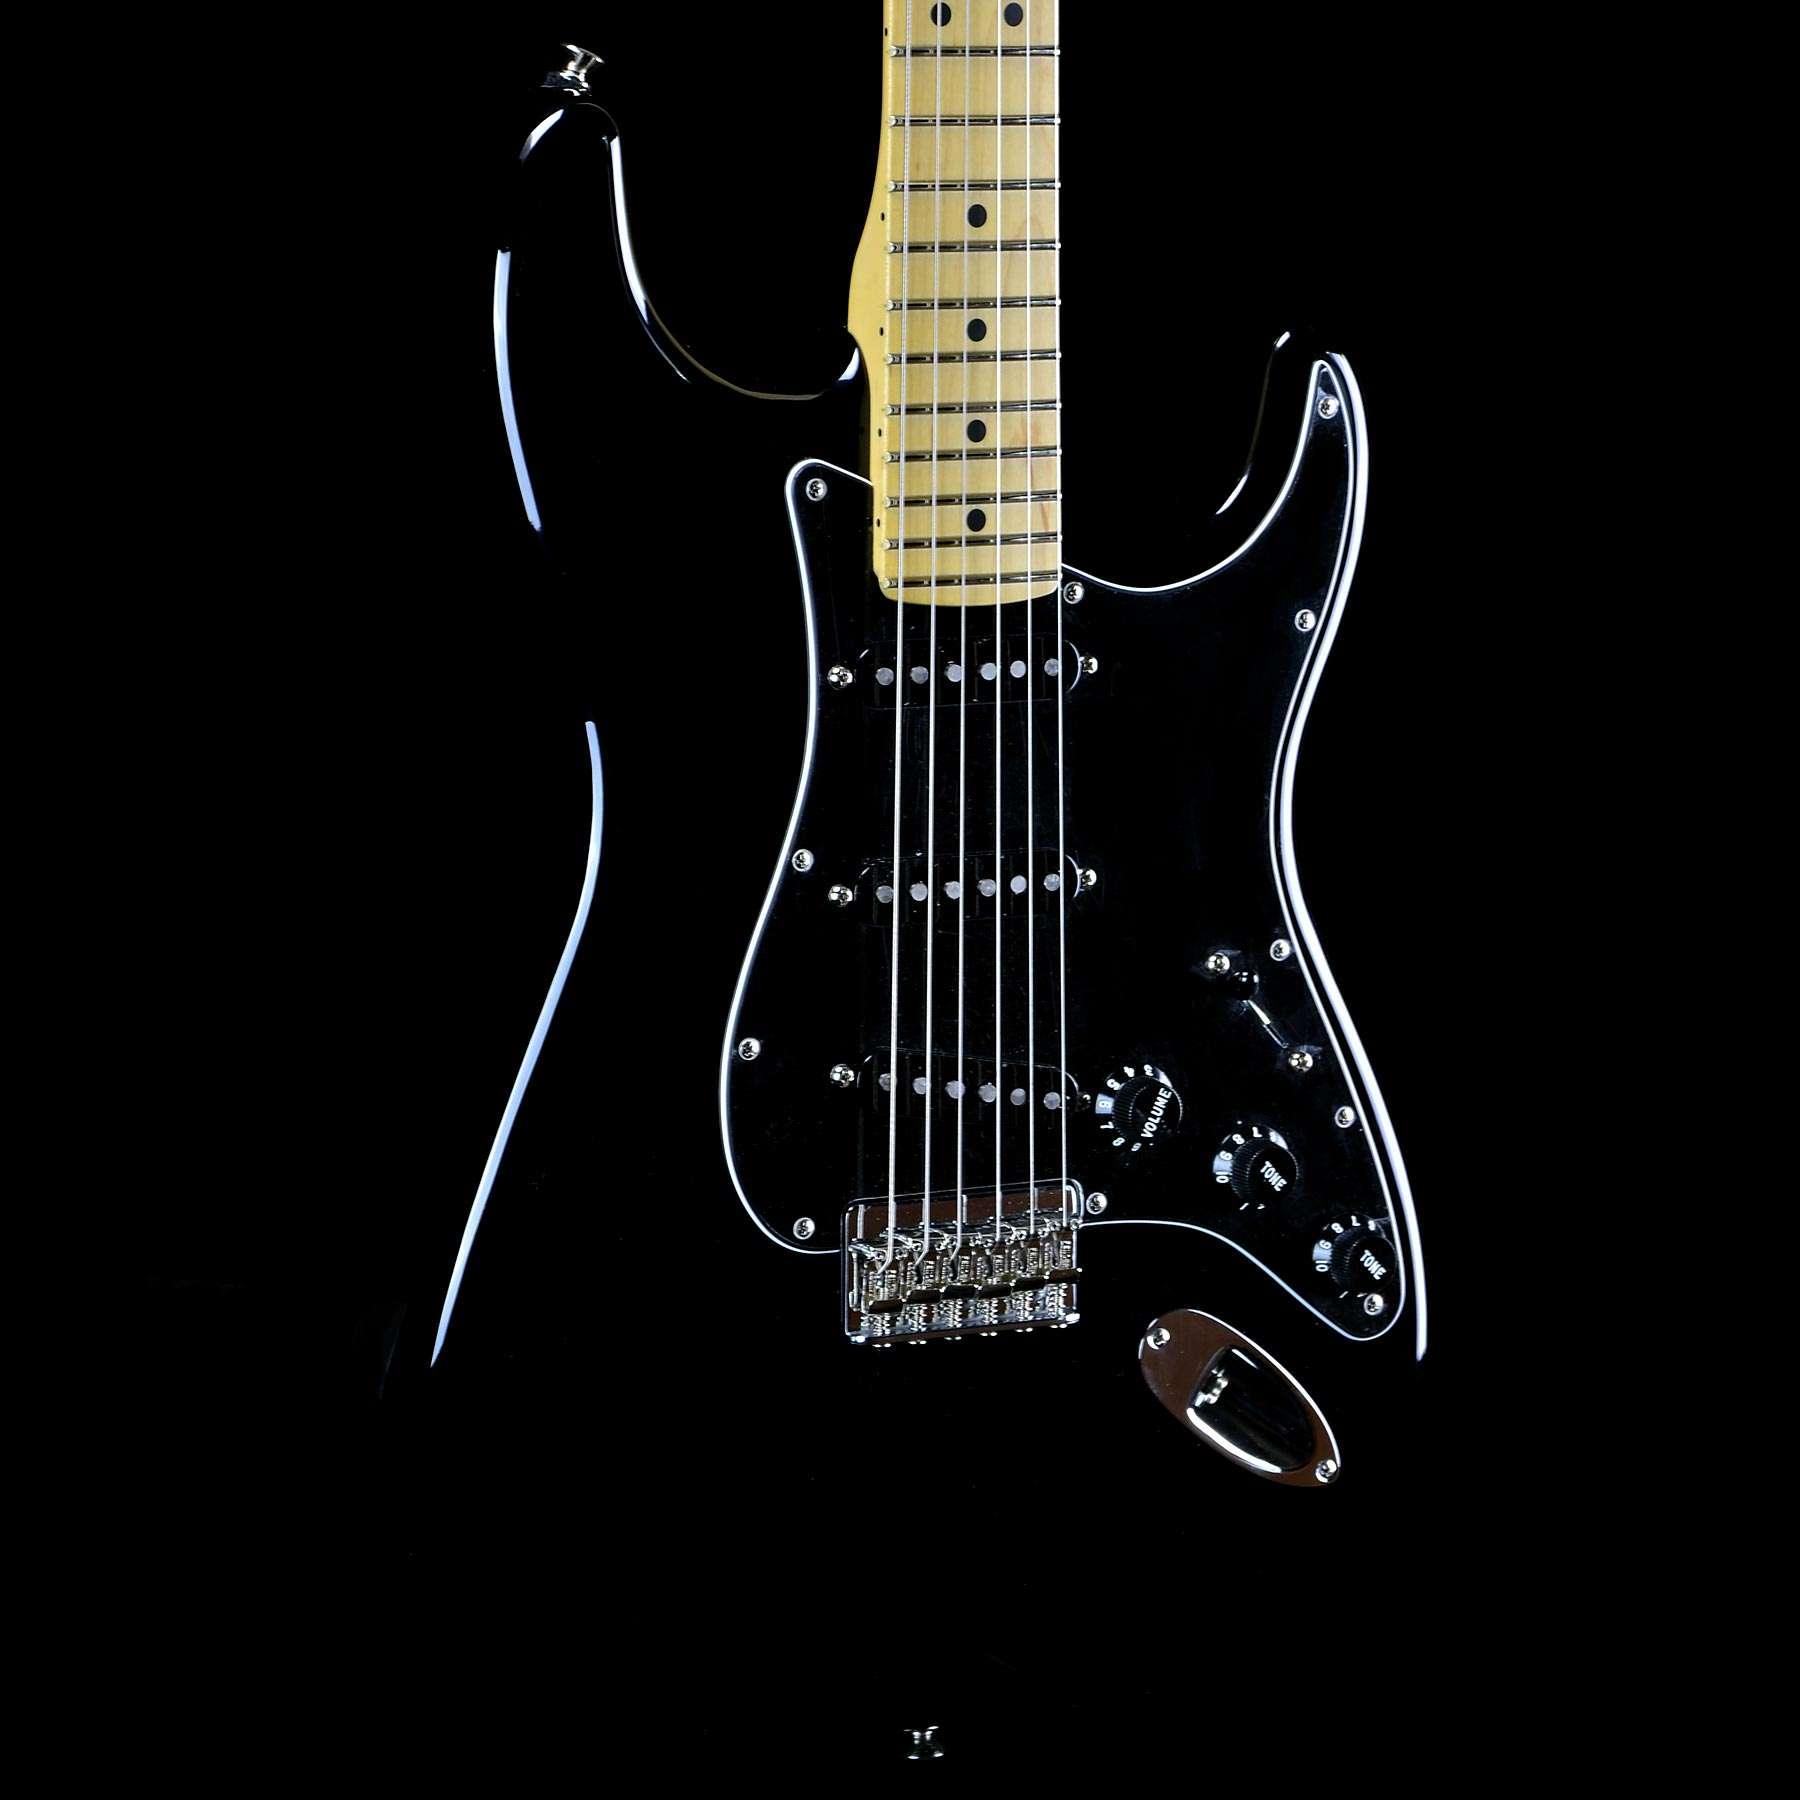 American Vintage 70s Stratocaster